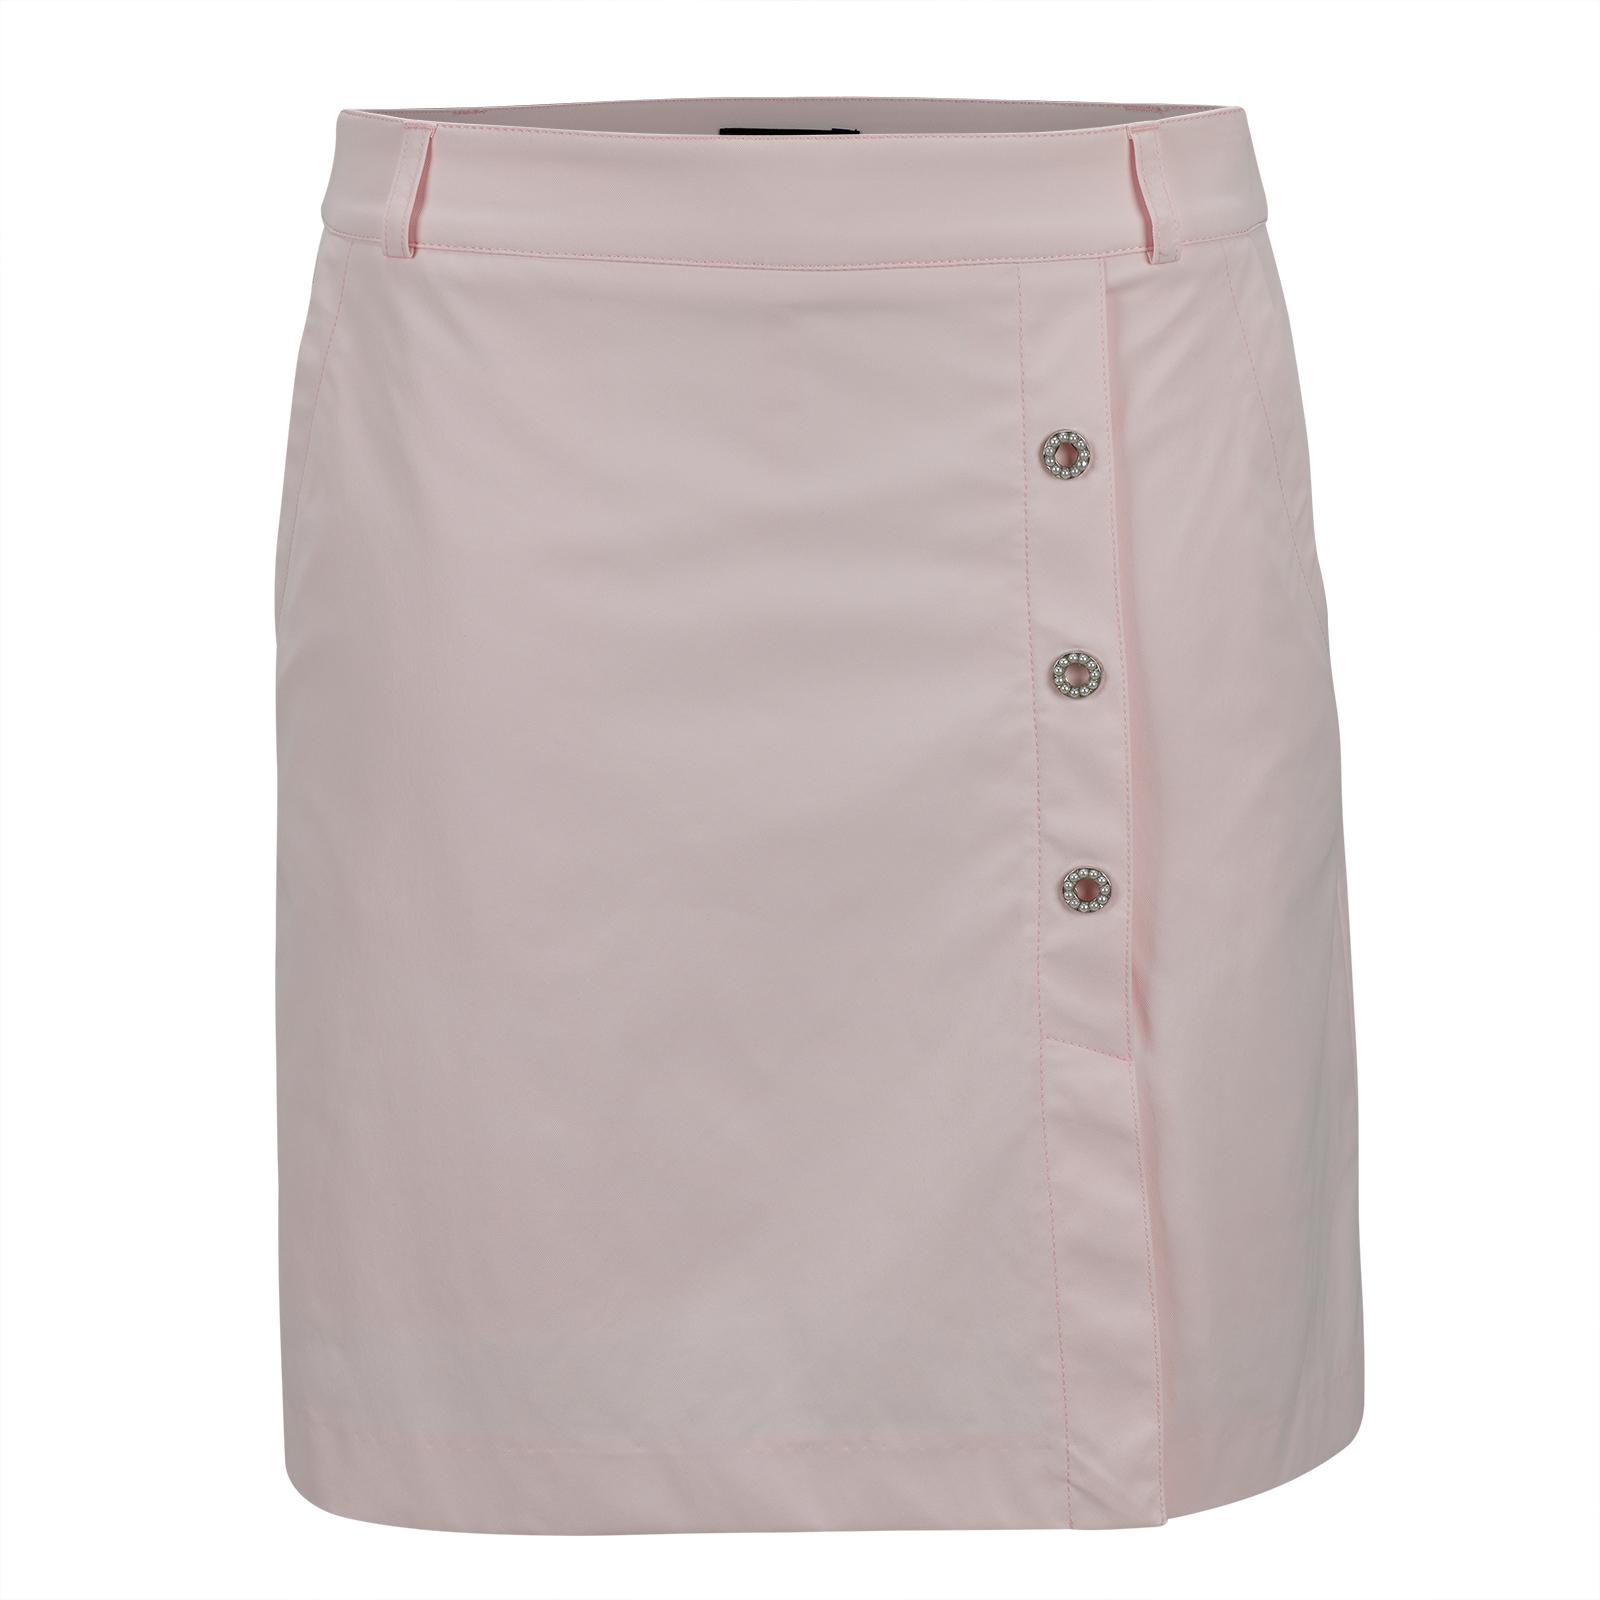 Damen Funktions-Golfskort Medium mit Sun Protection